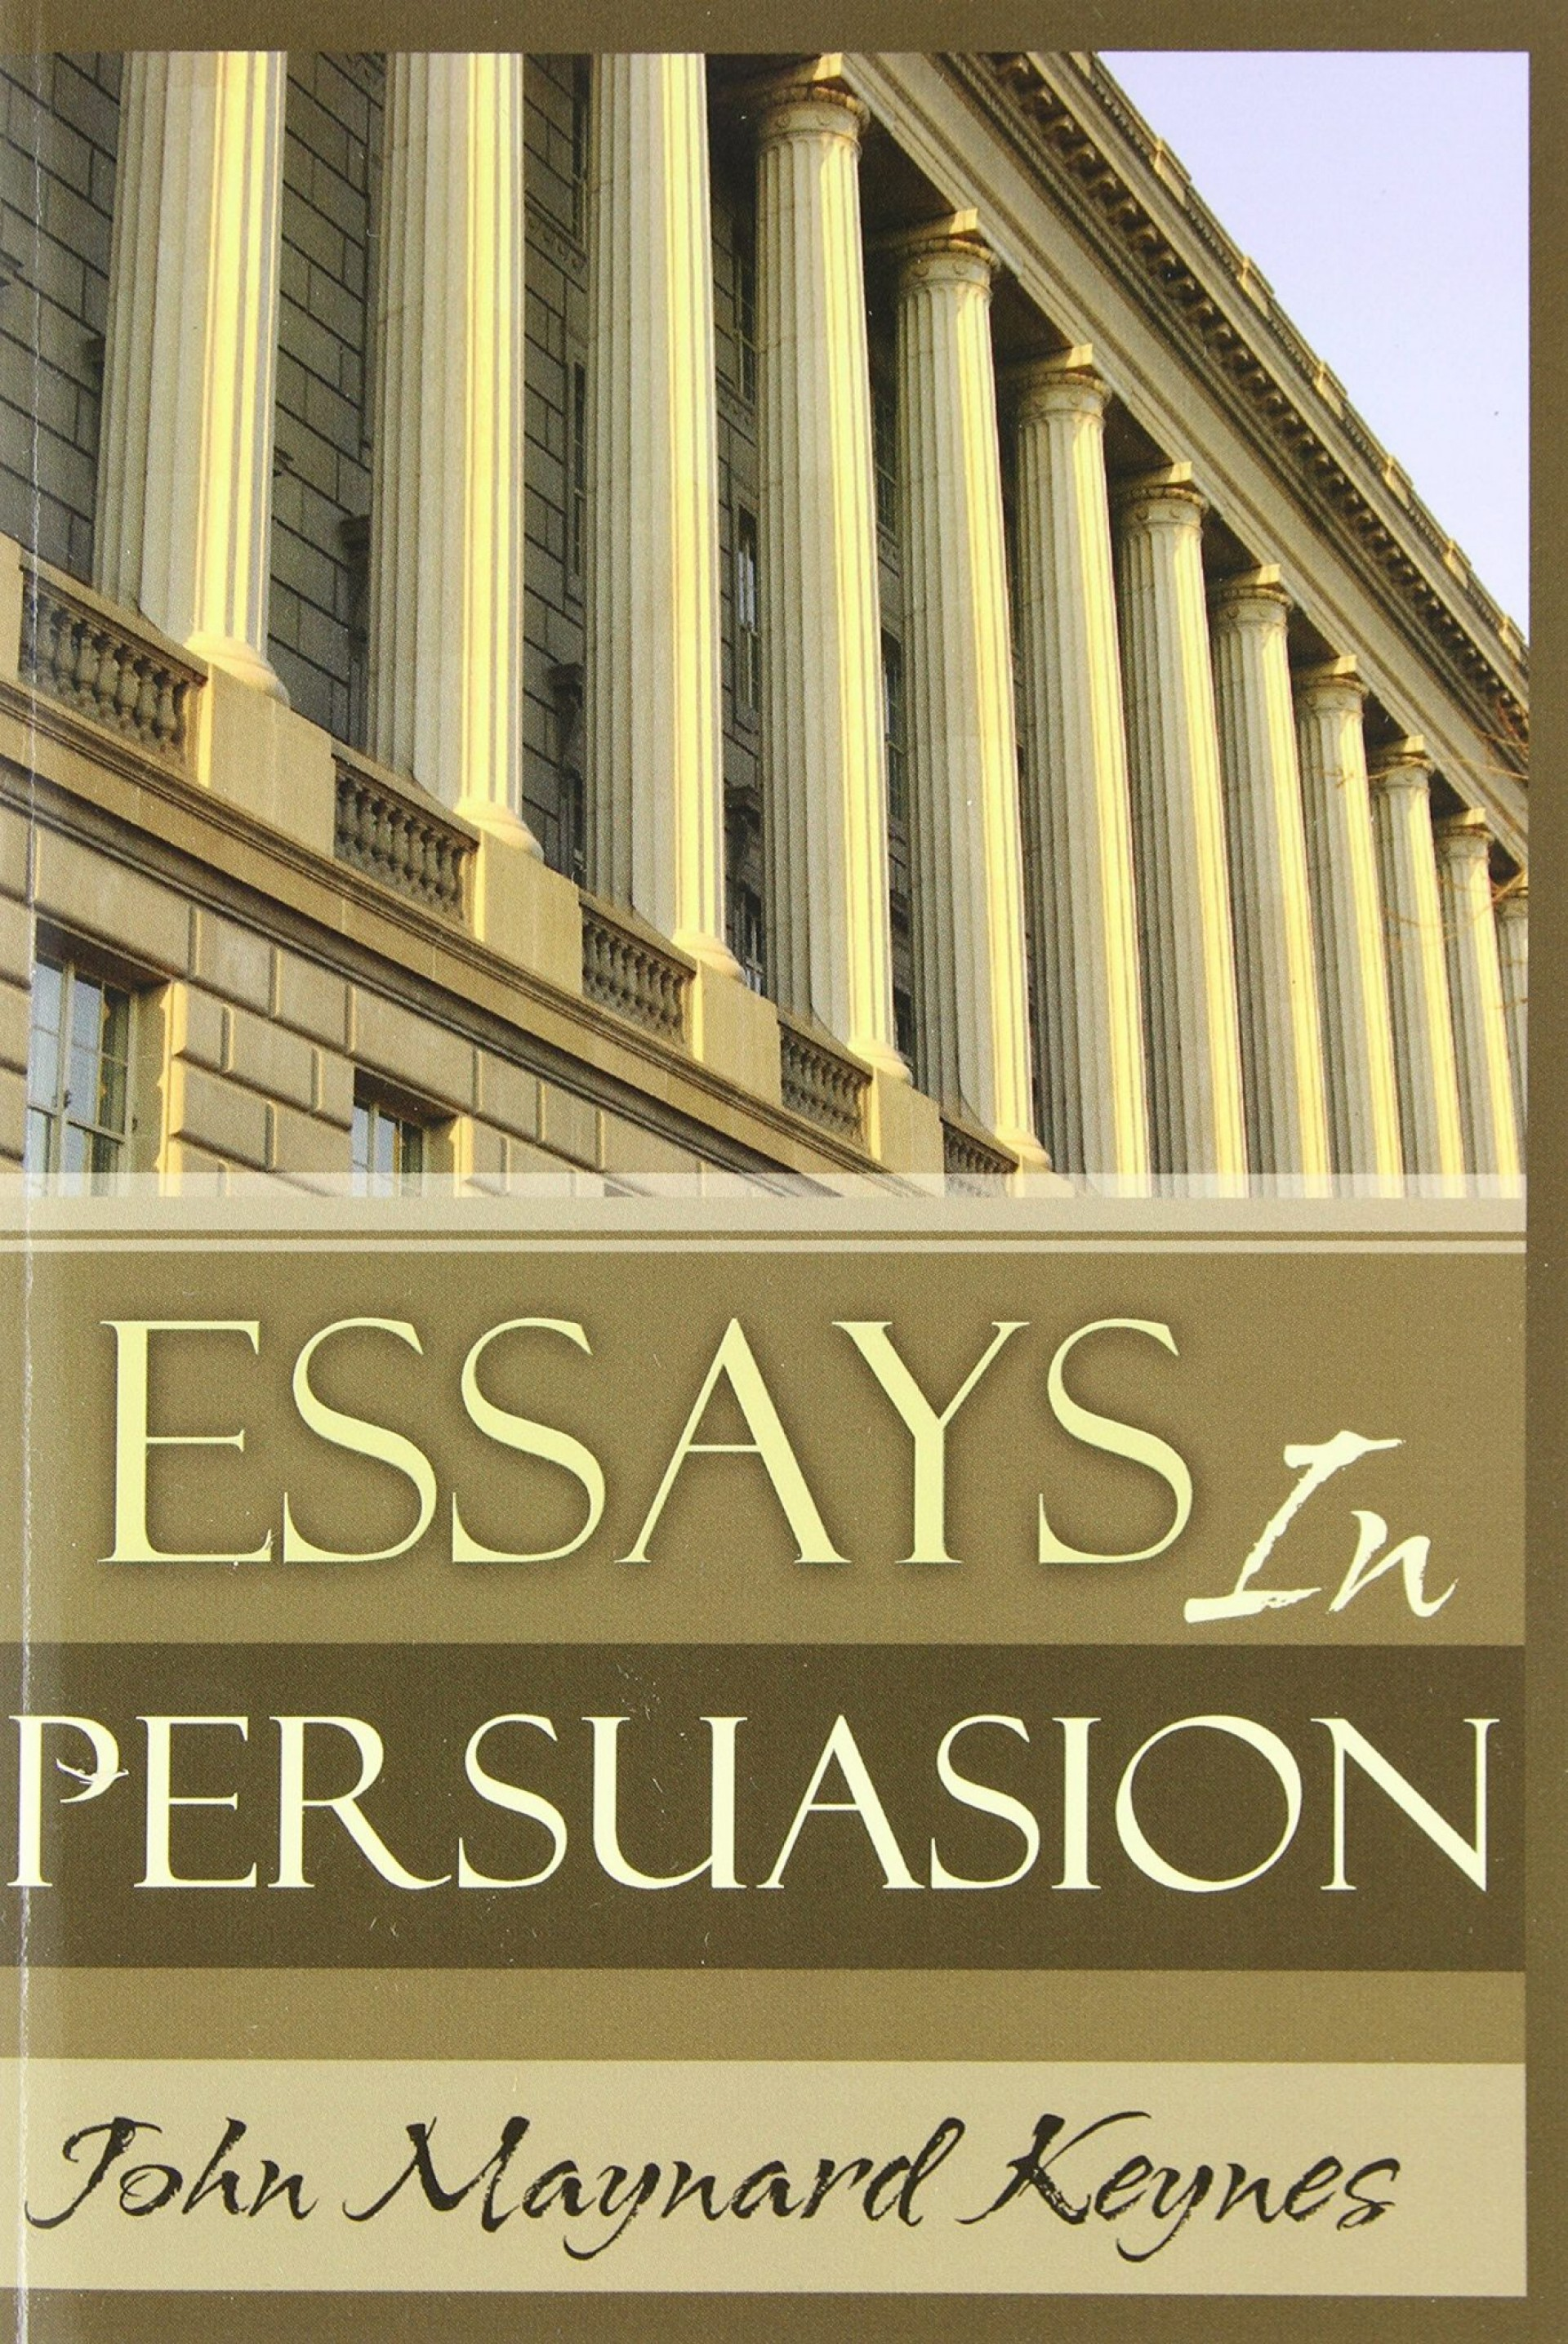 002 Essays In Persuasion By John Maynard Keynes Essay Remarkable Audiobook Pdf Summary 1920